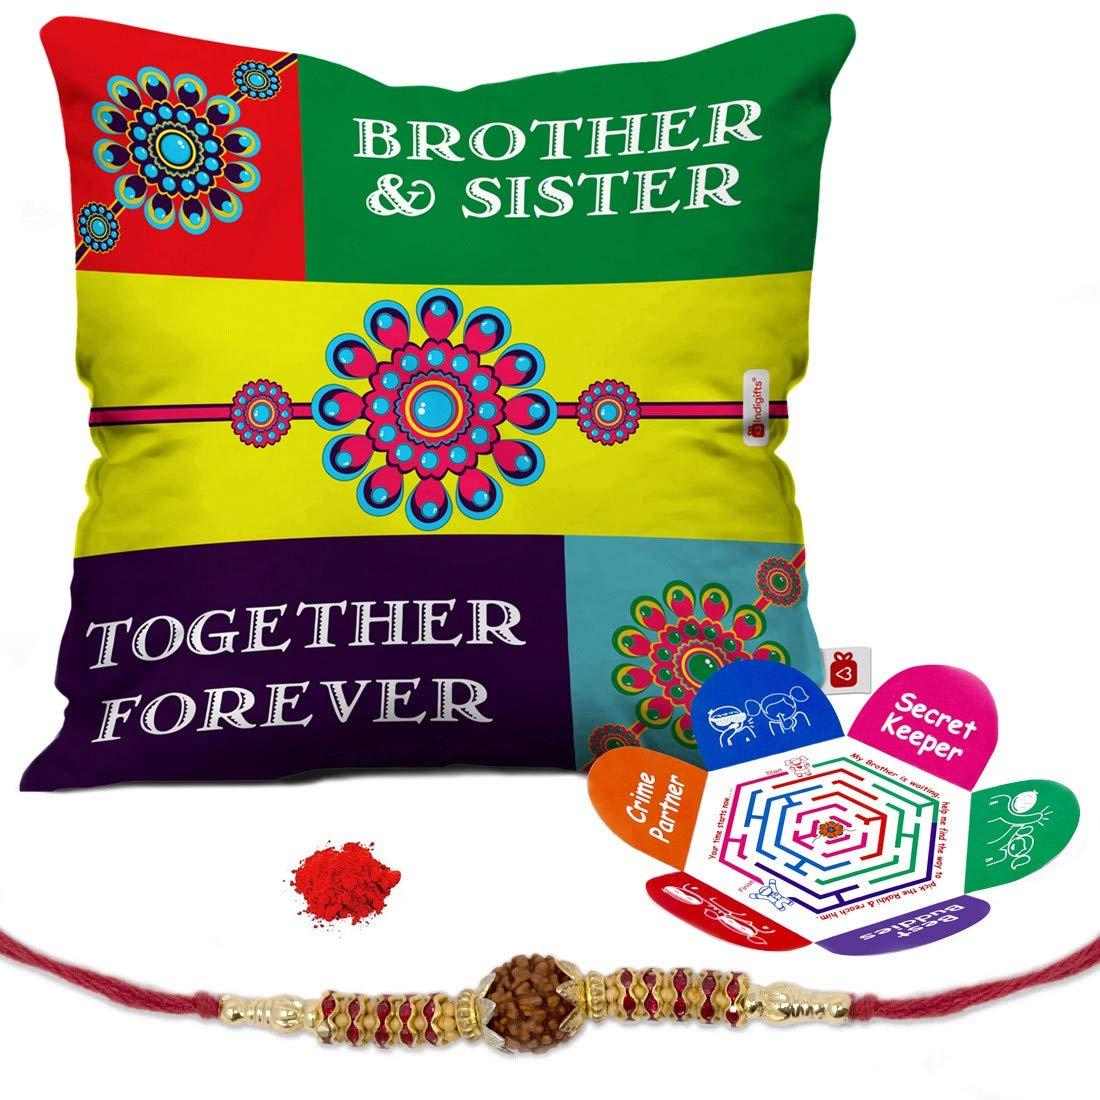 Buy Indi ts Rakhi Gifts for Brother Set of Bro Sis